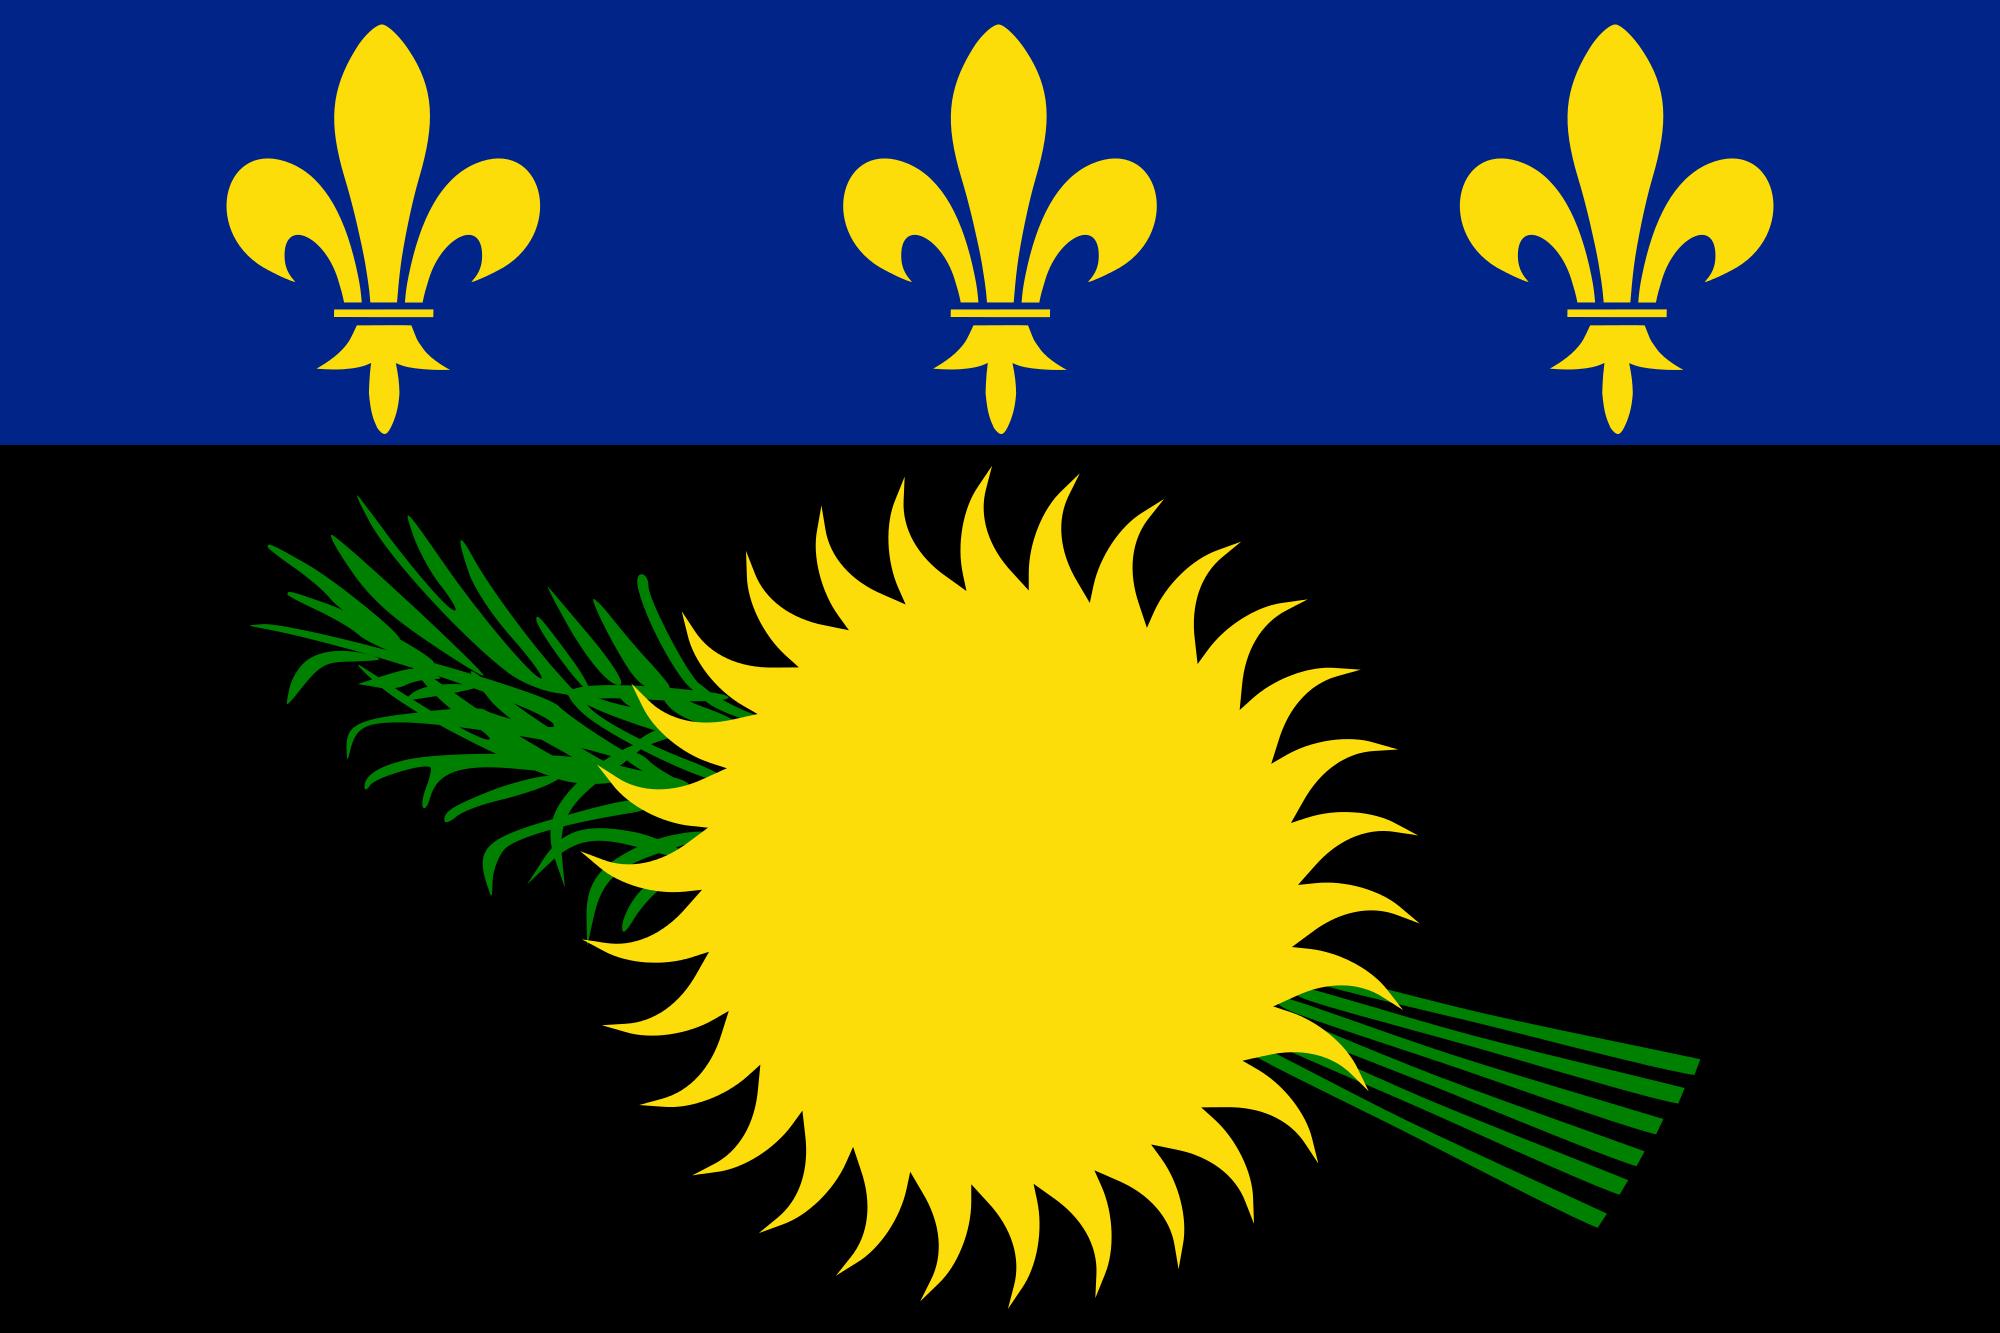 guadalupe, paese, emblema, logo, simbolo - Sfondi HD - Professor-falken.com